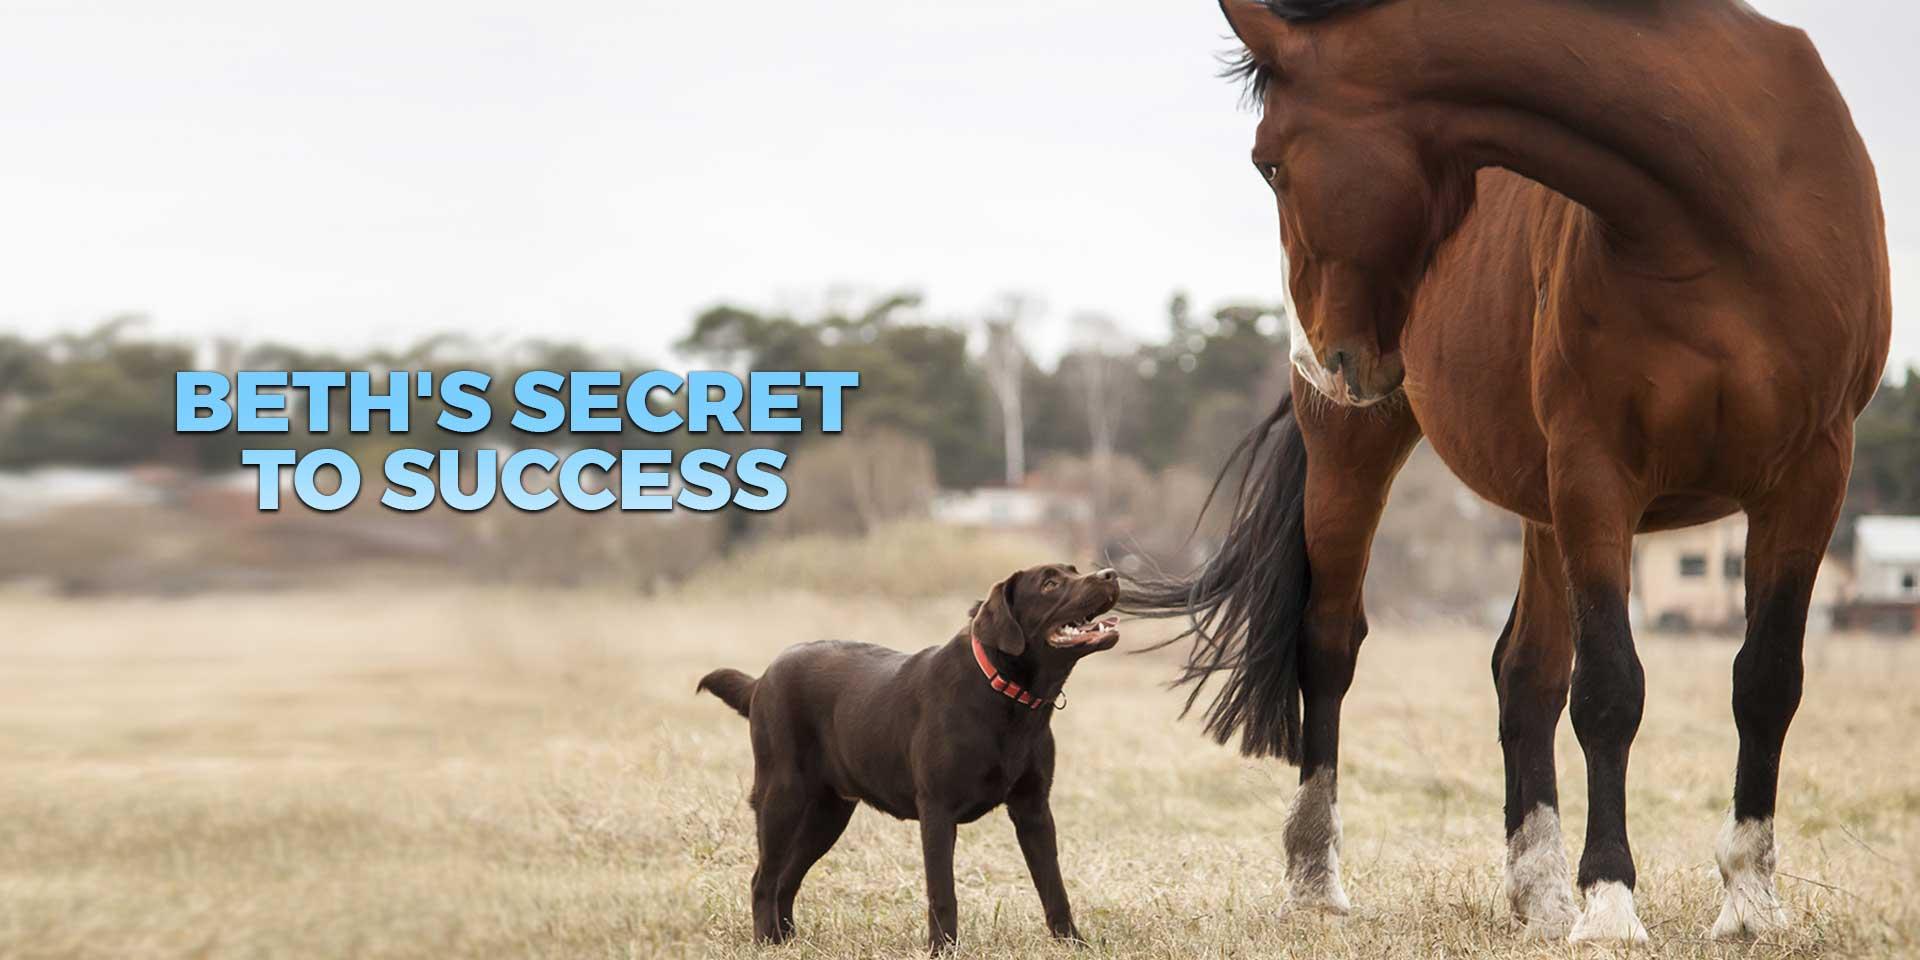 Beth's Secret to Success